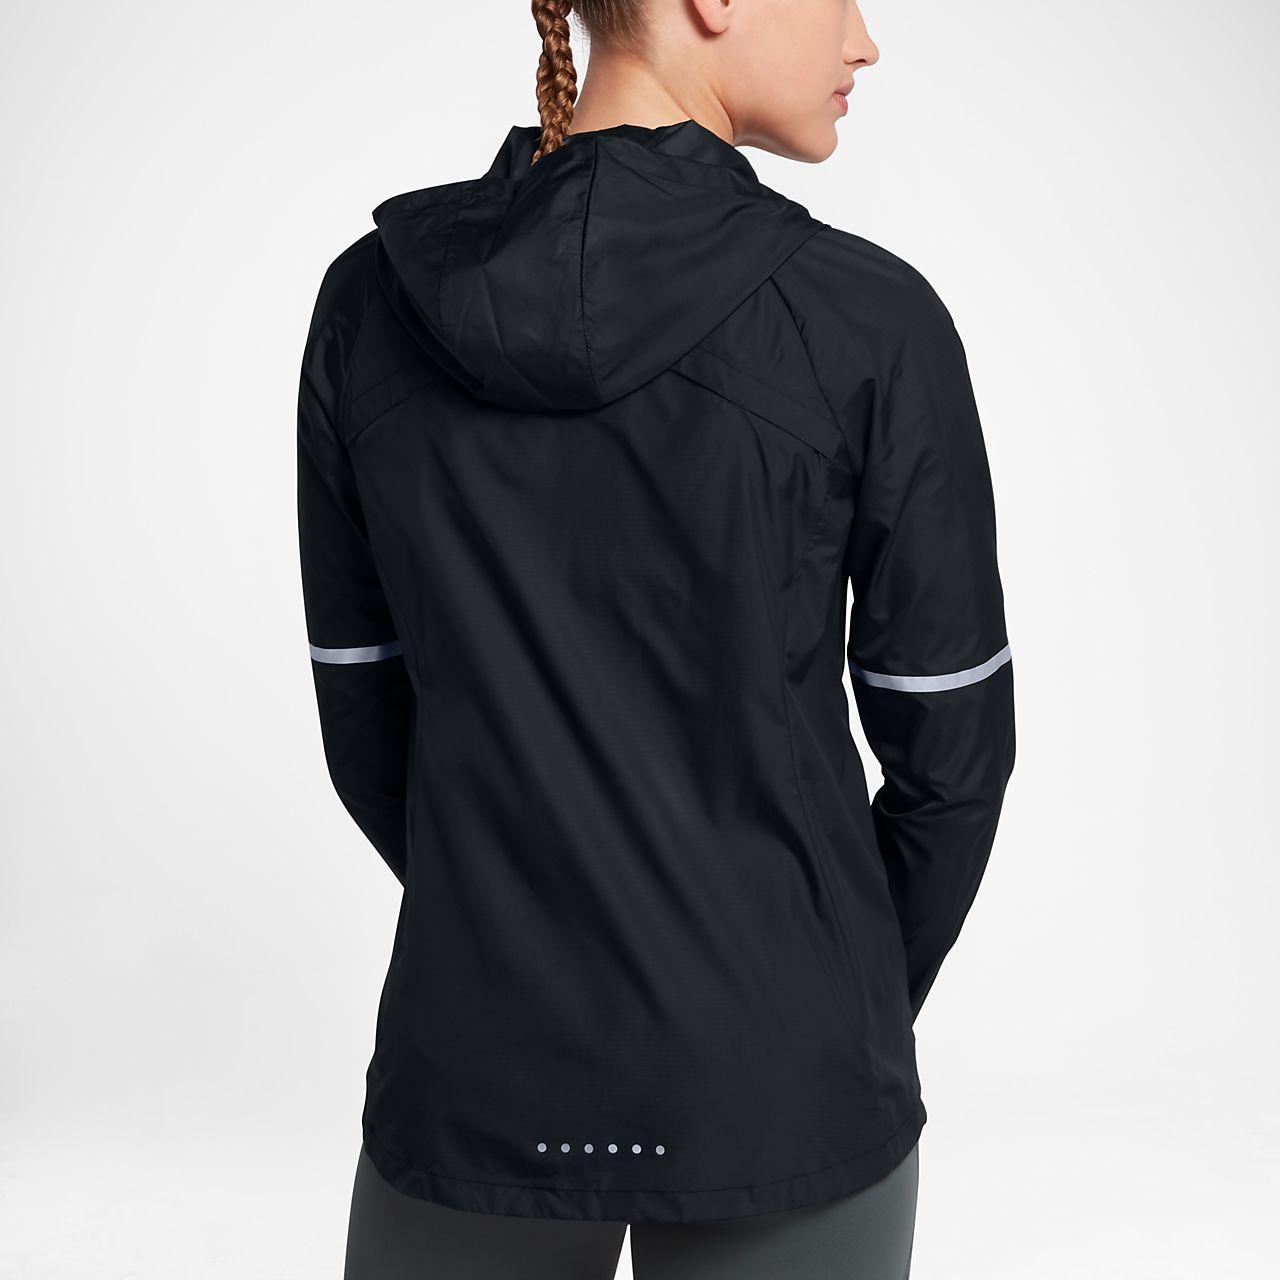 a66f02292988 Low Resolution Nike Shield Women s Running Jacket Nike Shield Women s Running  Jacket